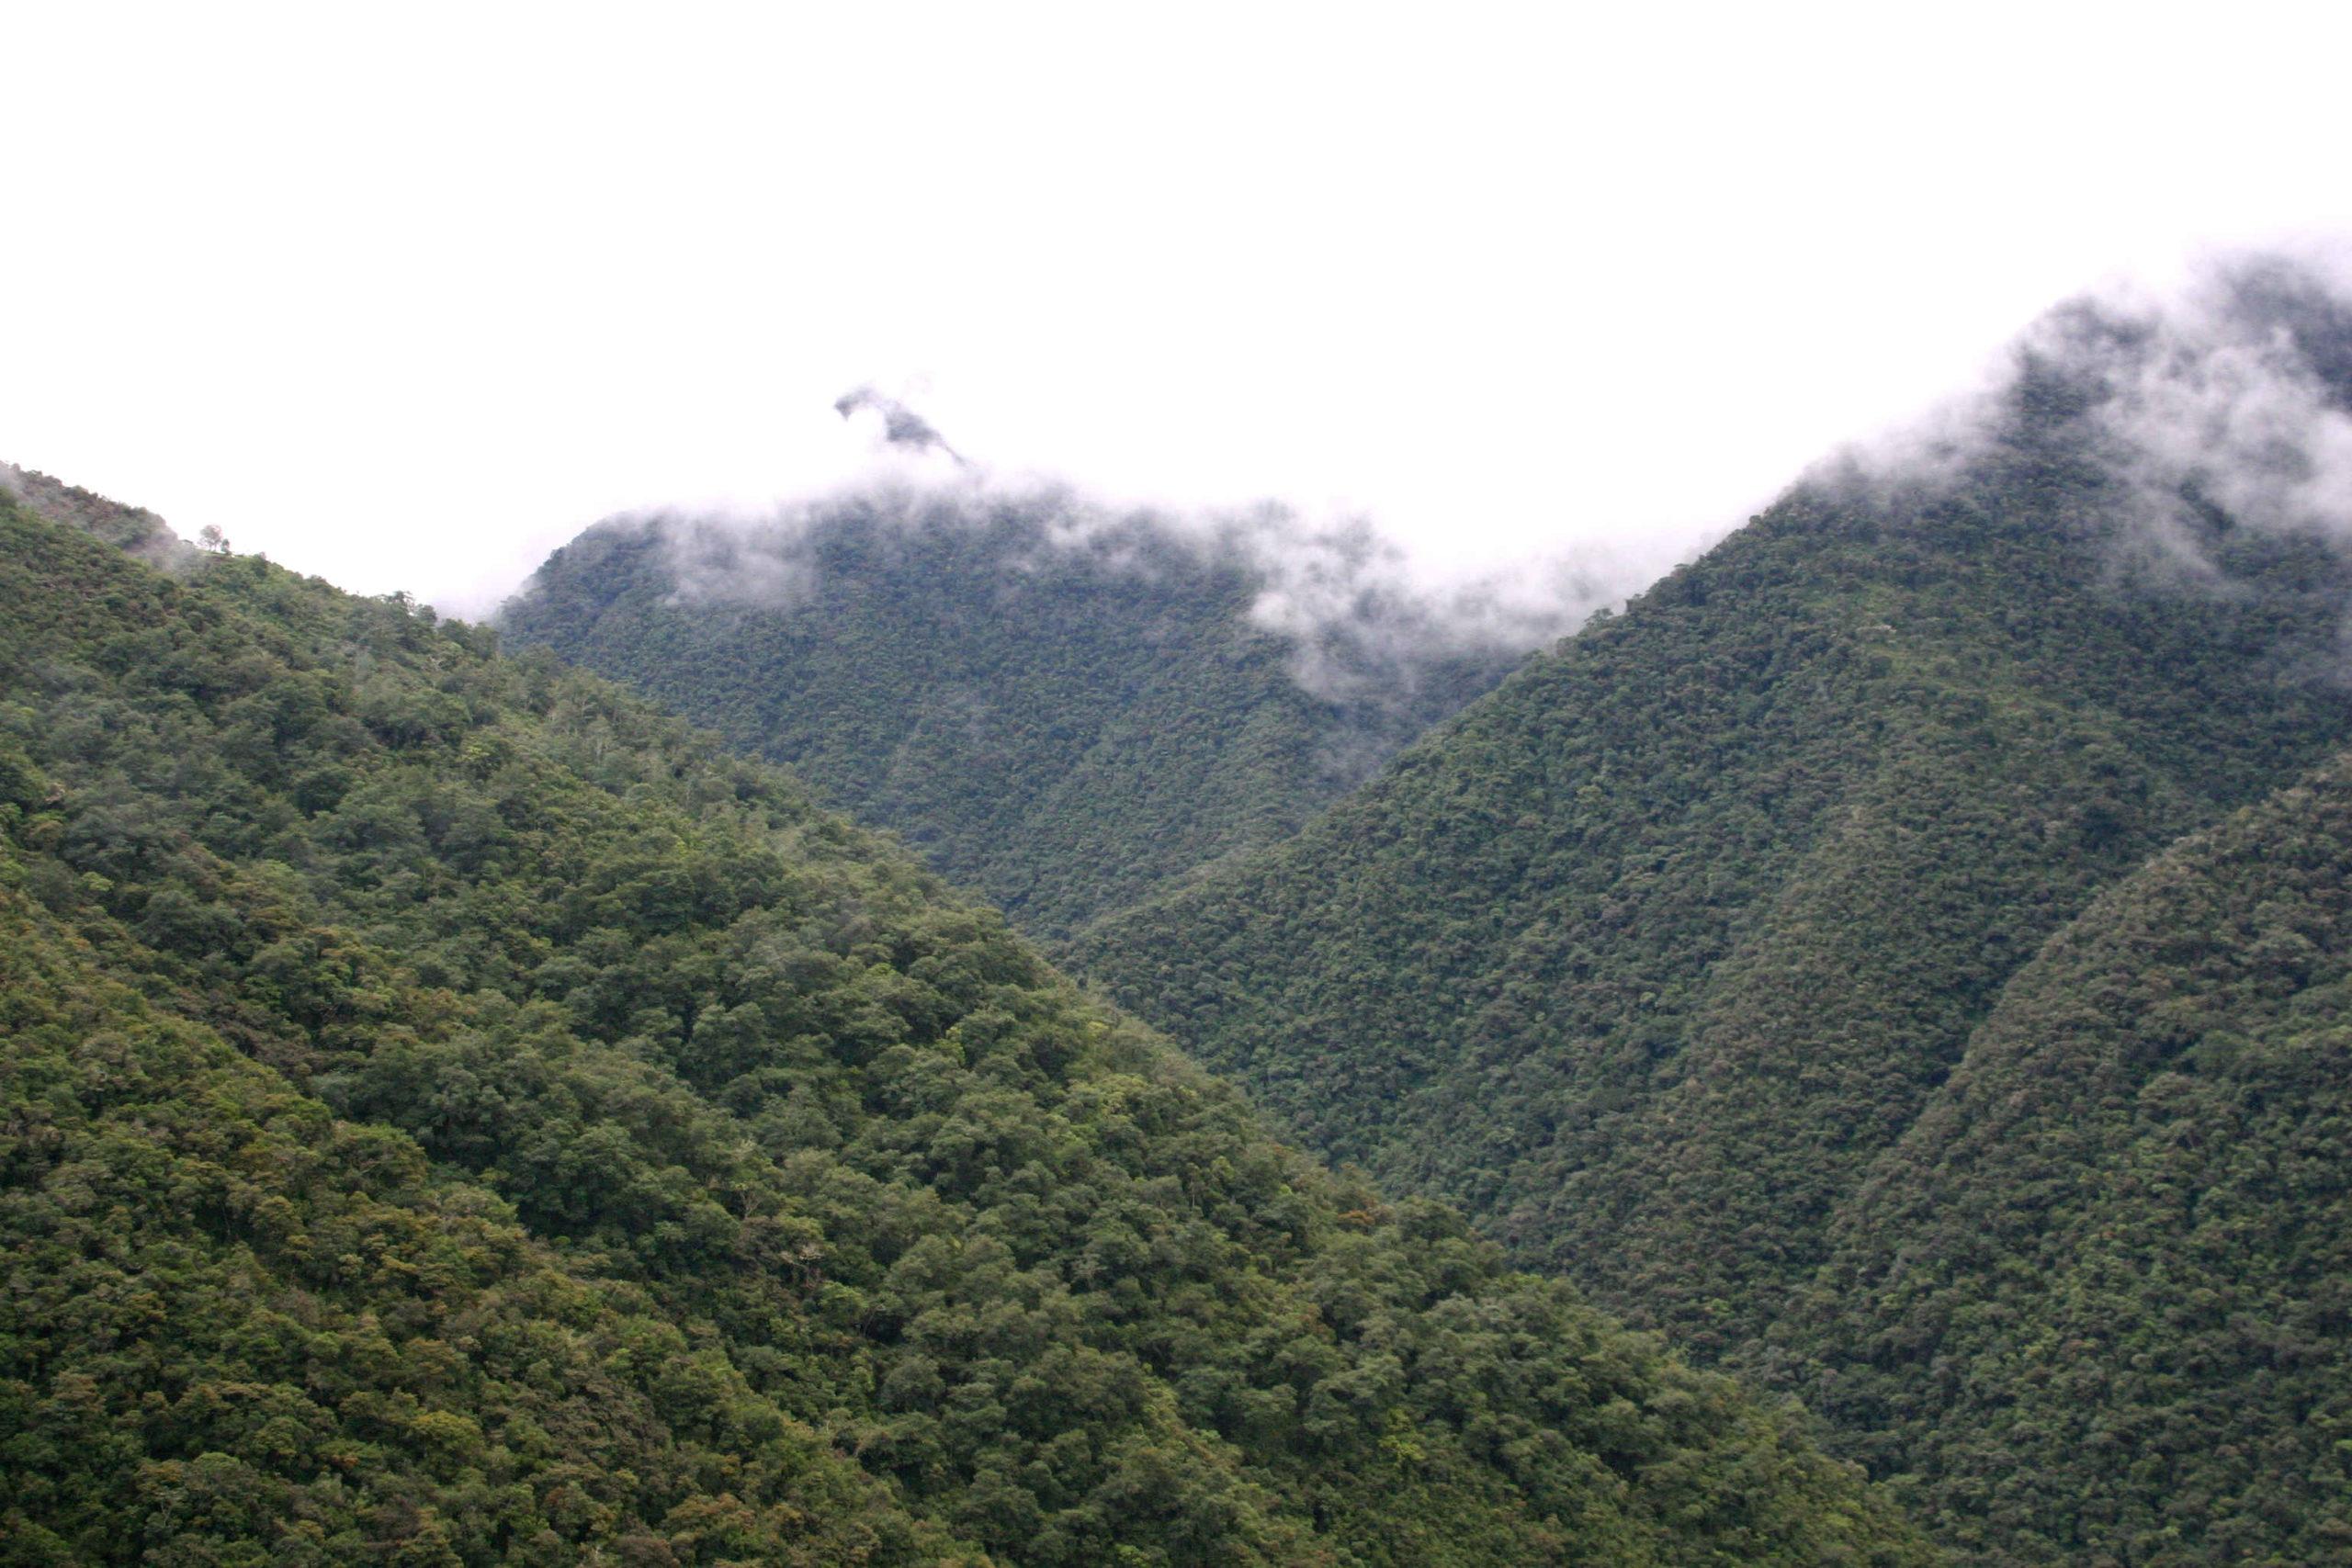 Rain forest in Bolivia - photo by Felix Schaumann